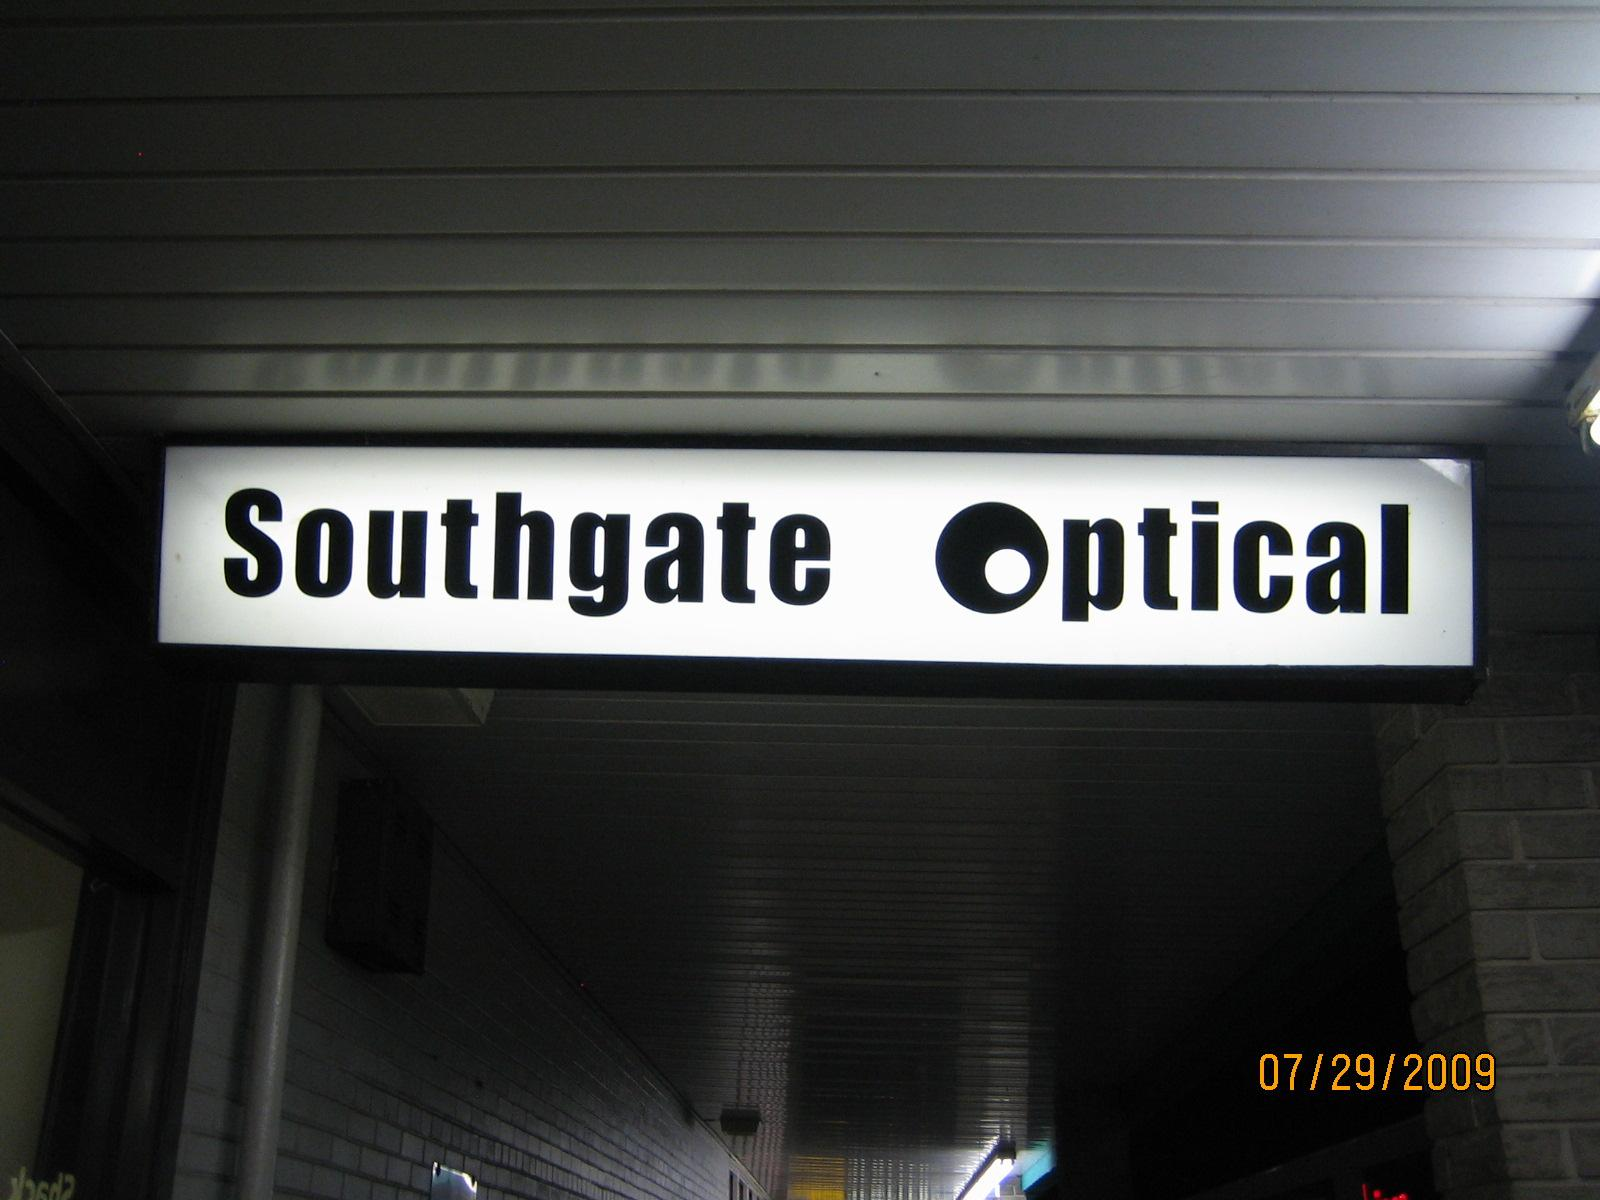 Southgate Optical